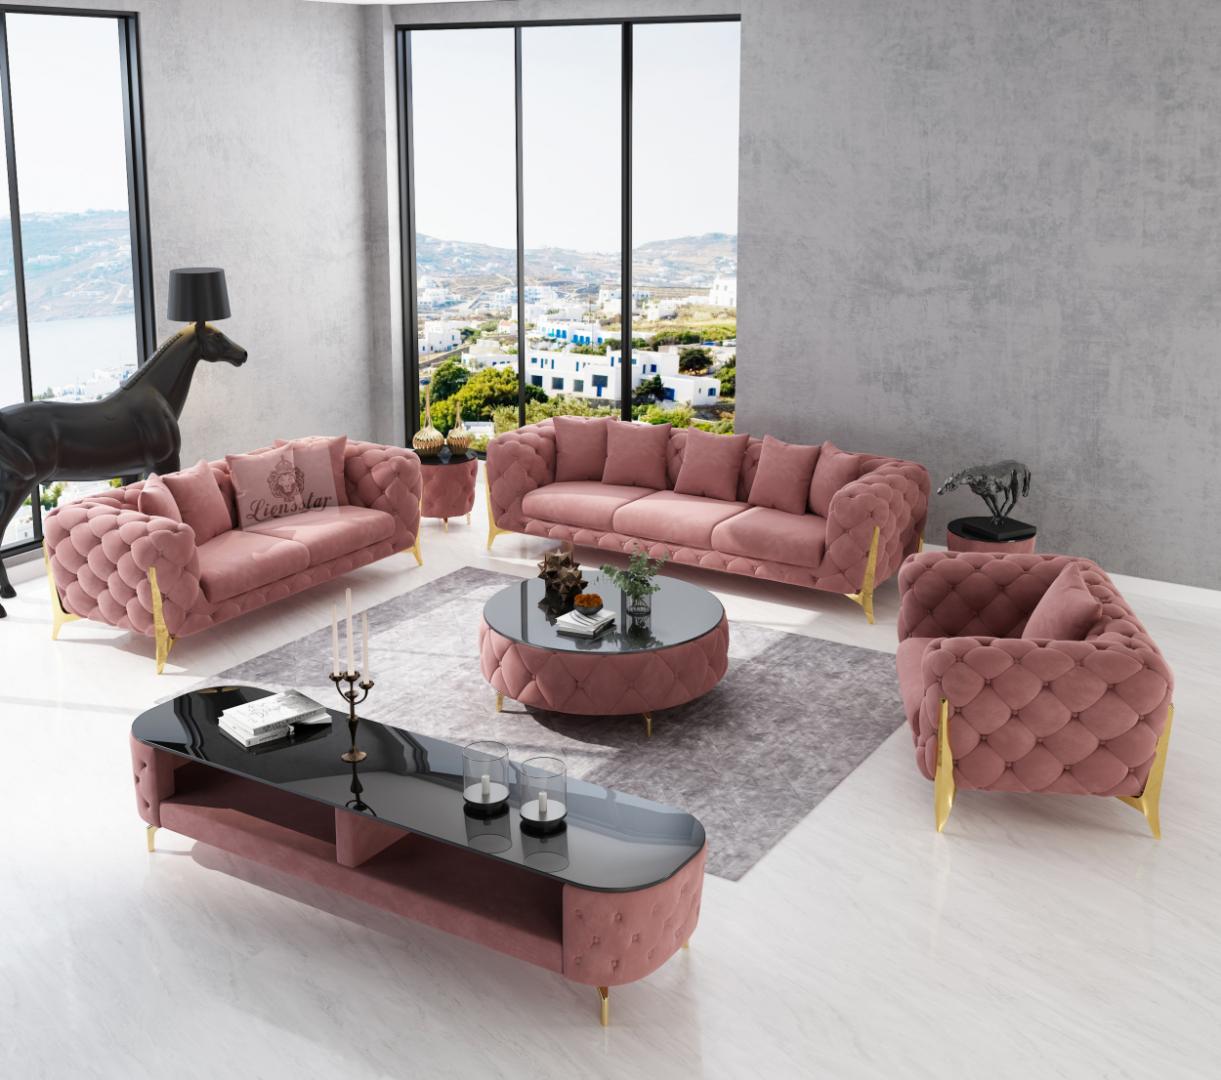 Luxus Design Sofa Set Clouds II